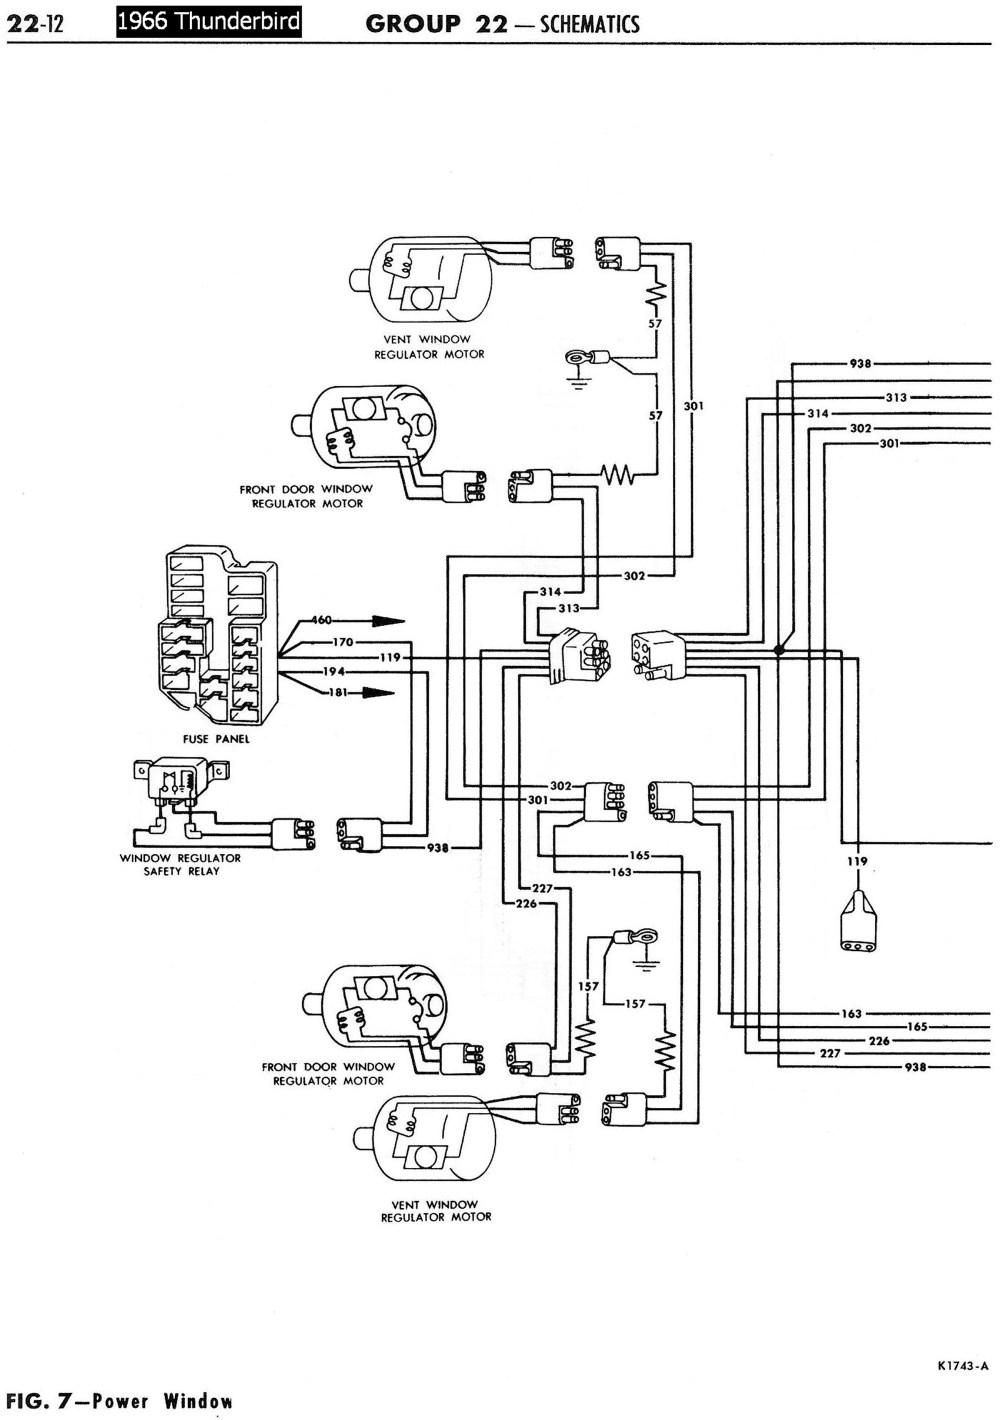 medium resolution of 1958 thunderbird wiring diagram wiring diagram details 1958 thunderbird wiring diagram